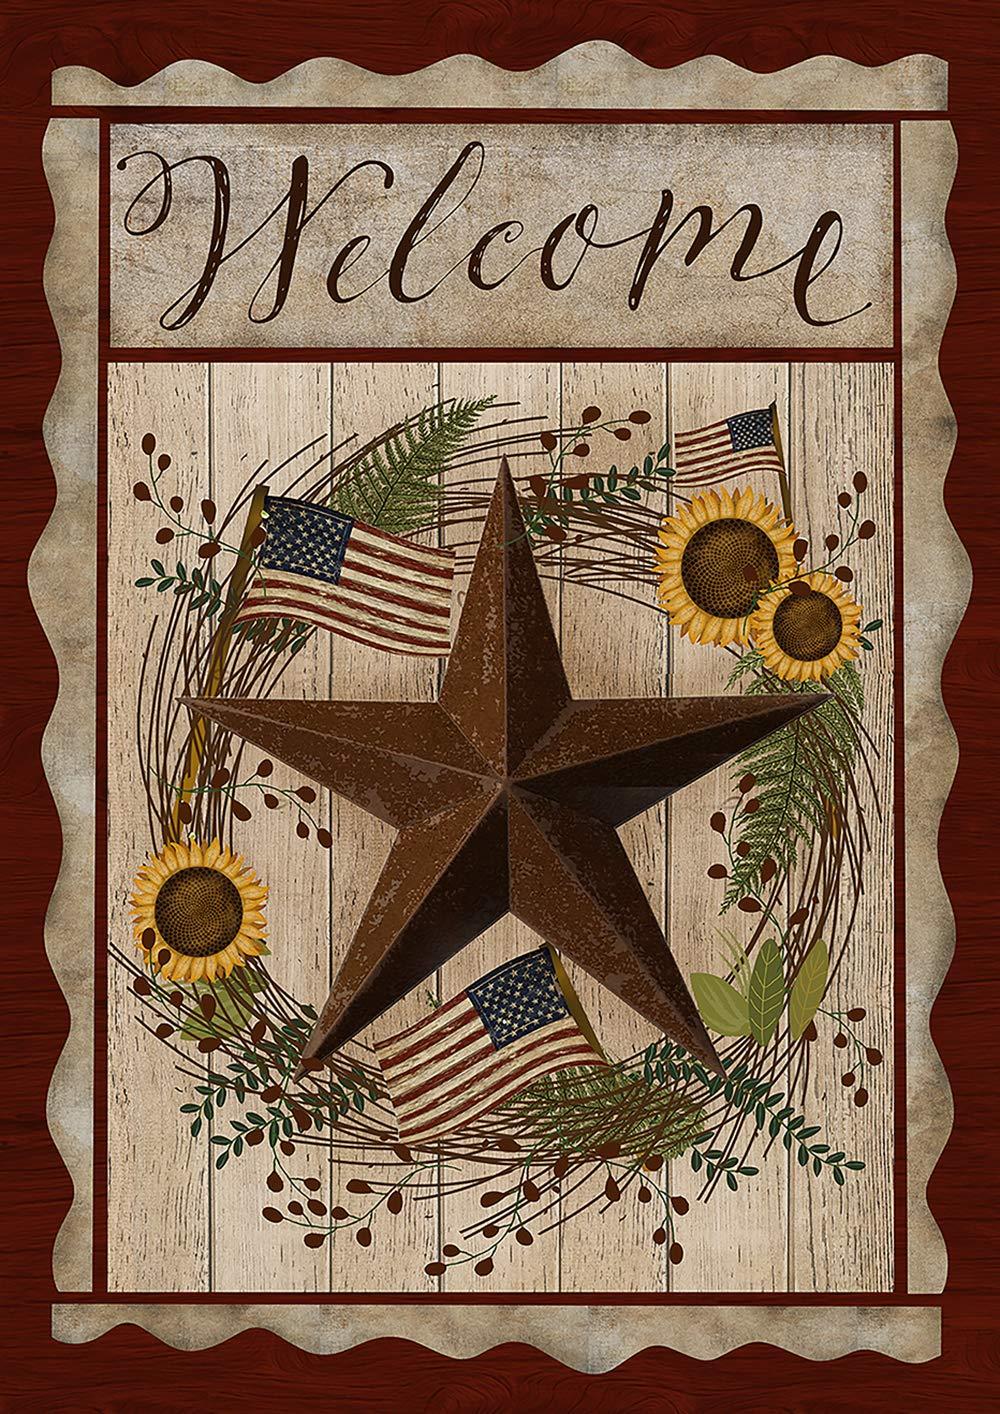 Toland Home Garden 1012203 Barn Star Welcome 28 x 40 Inch Decorative, Fall Autumn Patriotic Farm, House Flag